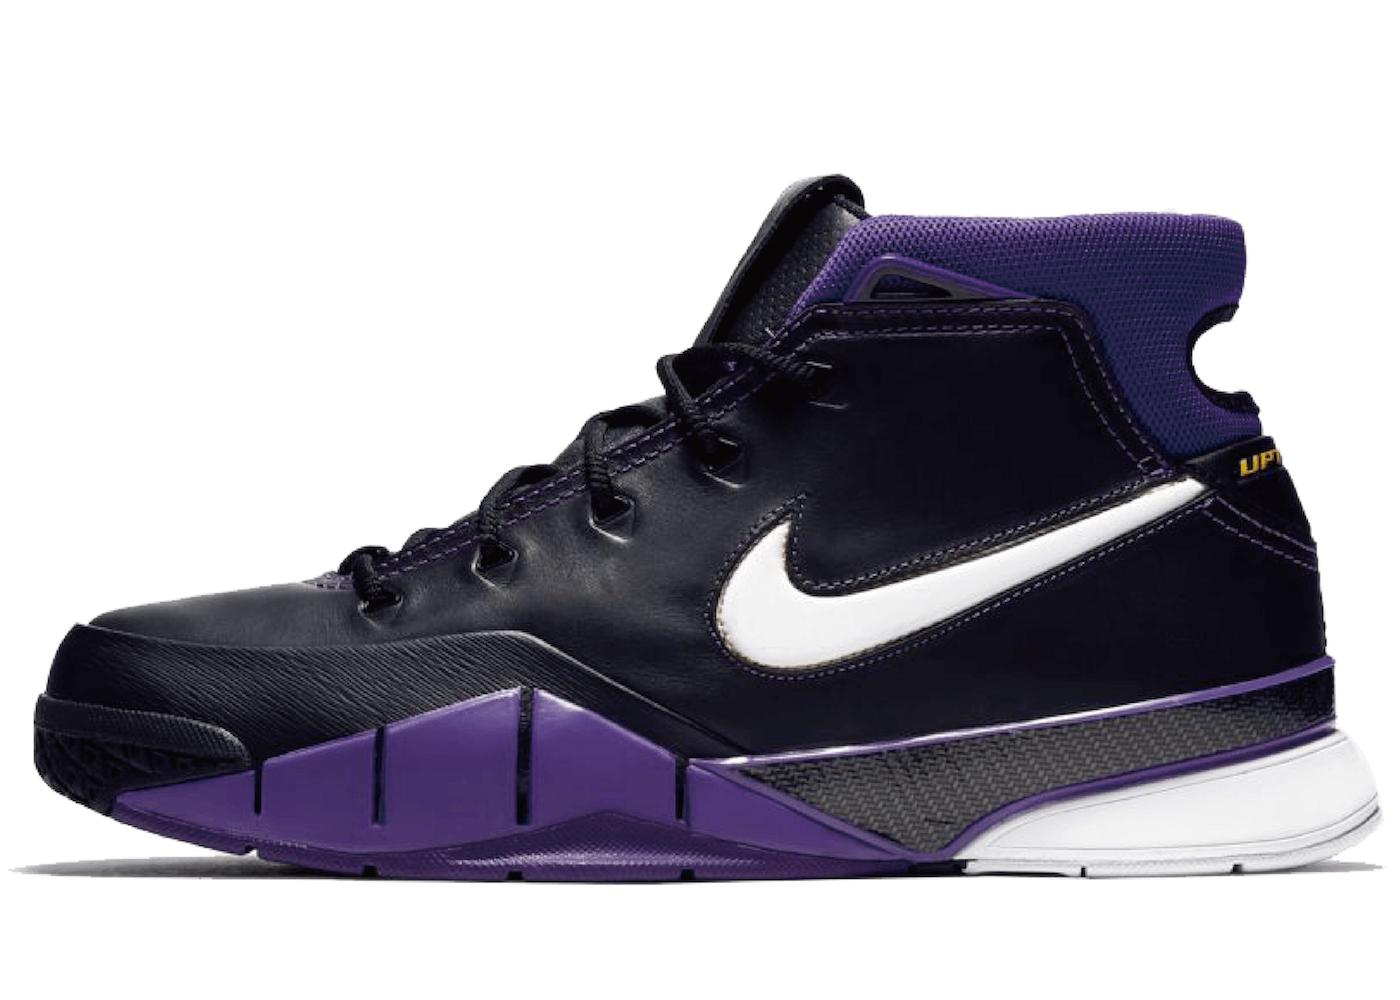 Nike Kobe 1 Protro Purple Reignの写真